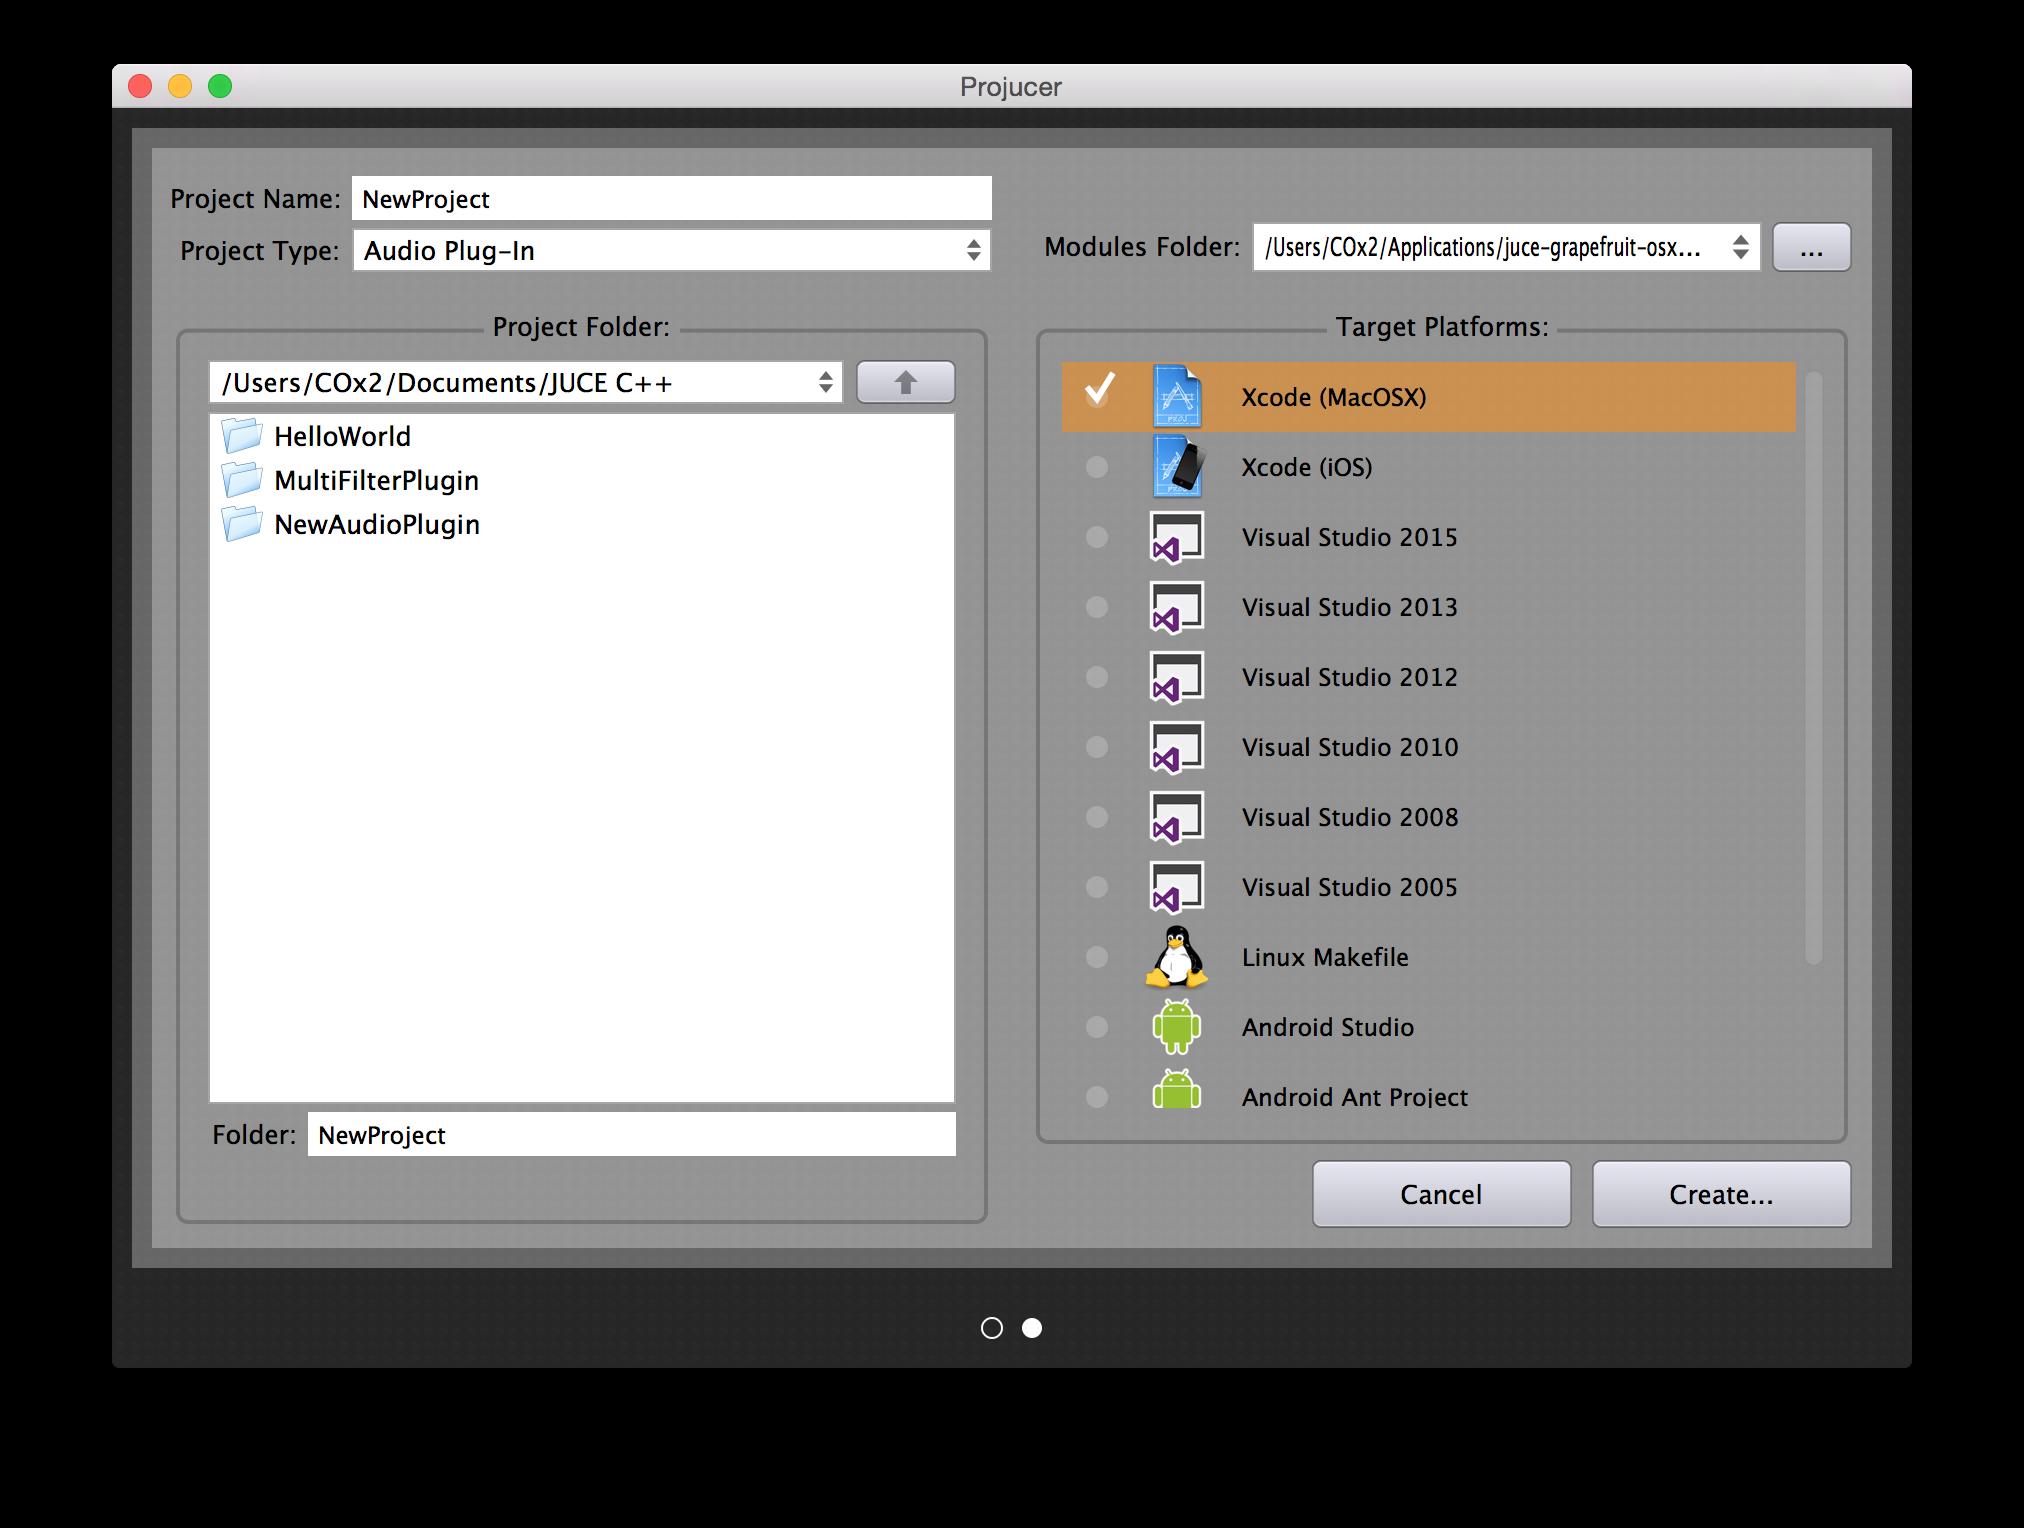 JUCE Frameworkを使ってVST/AudioUnitプラグインを作る Mac編